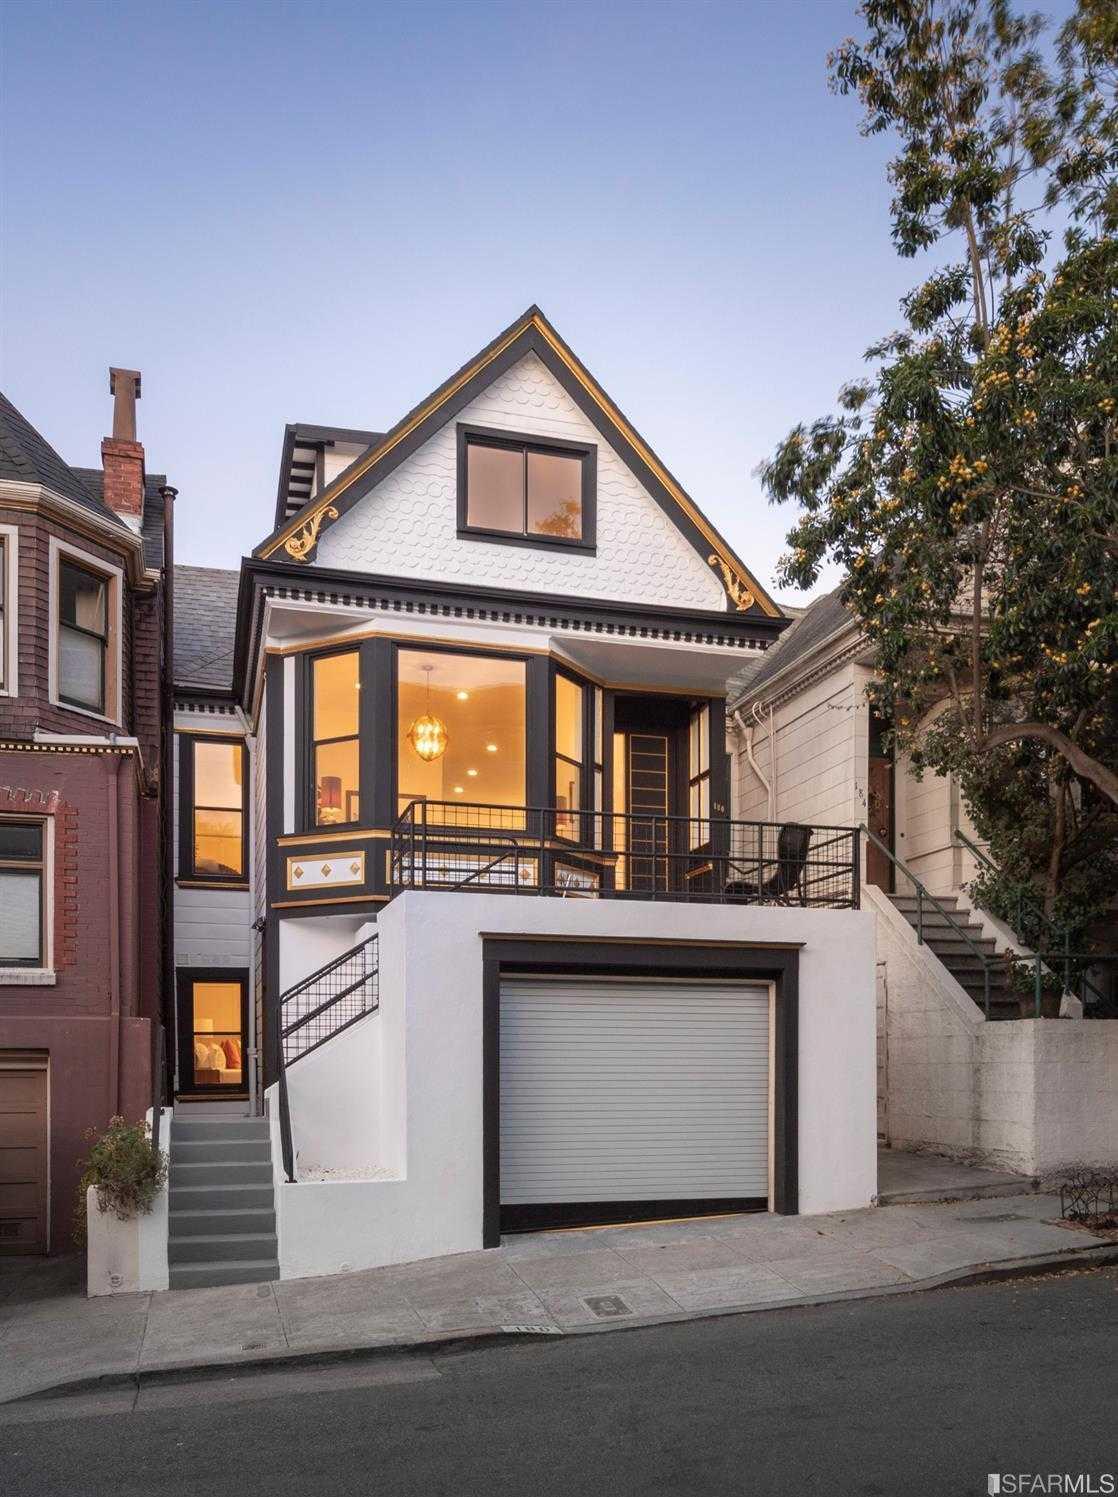 180 Downey St San Francisco, CA 94117